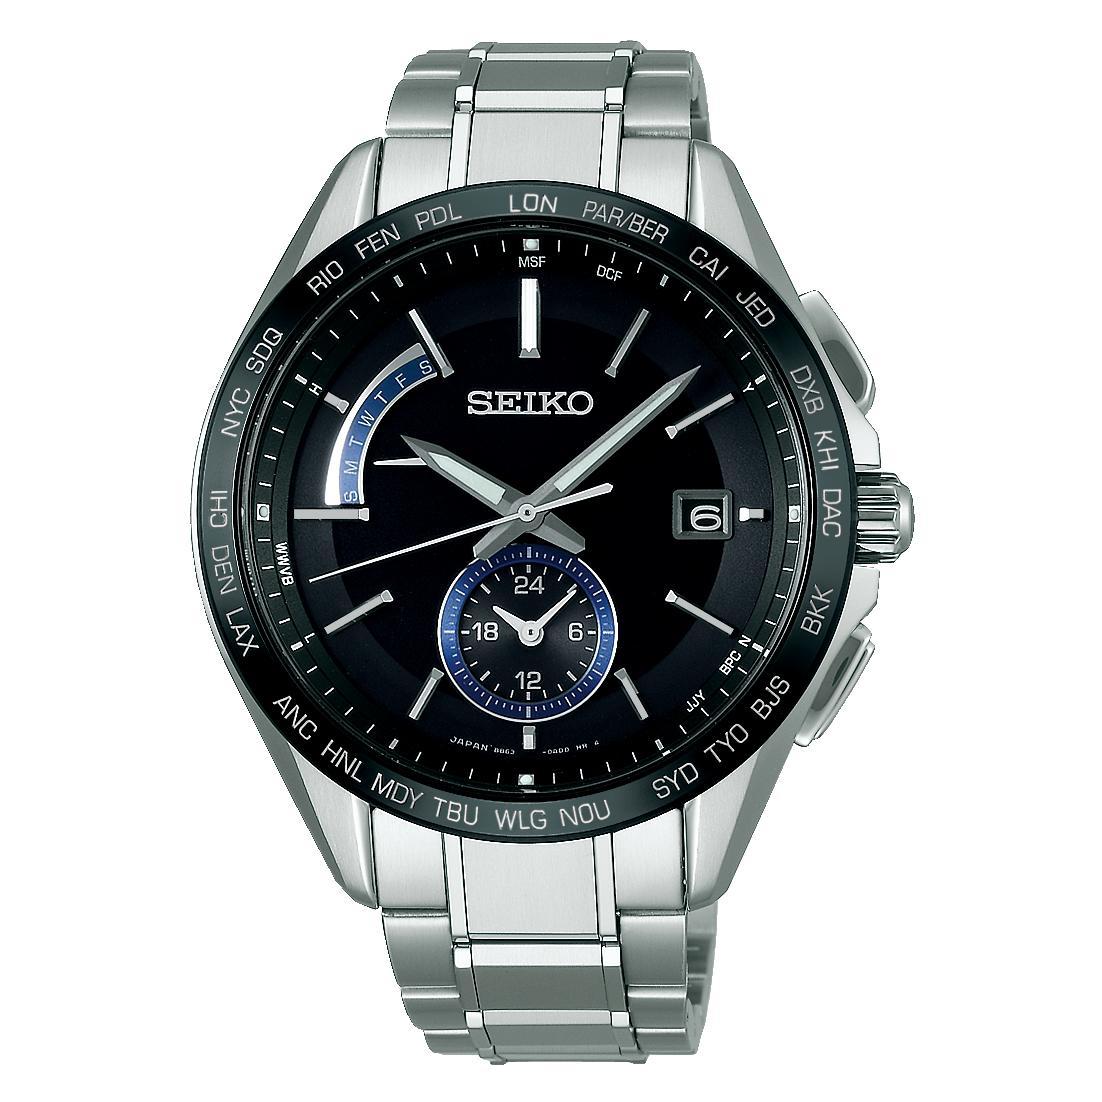 SEIKO セイコー BRIGHTZ ブライツSAGA235 ソーラー電波時計【正規販売店】